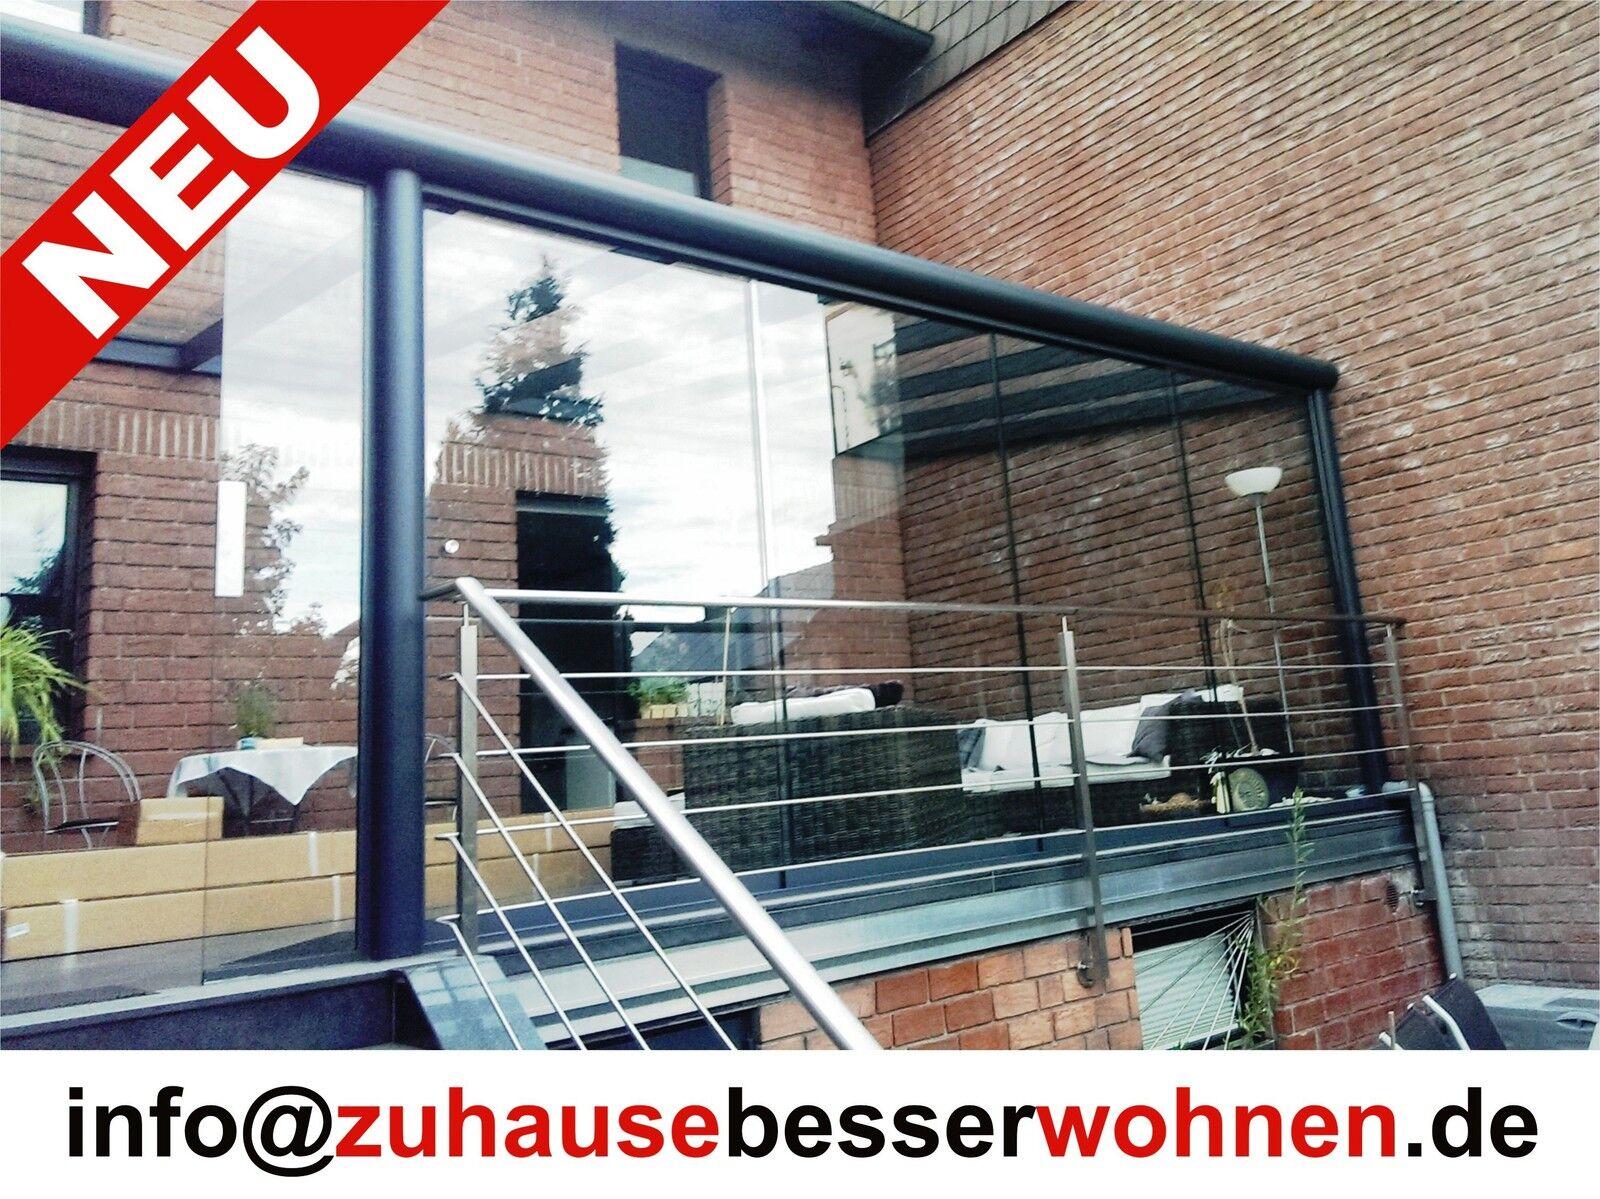 terrassen berdachung carport berdachung aluminium terrassendach vsg glas 6x2 5 eur. Black Bedroom Furniture Sets. Home Design Ideas